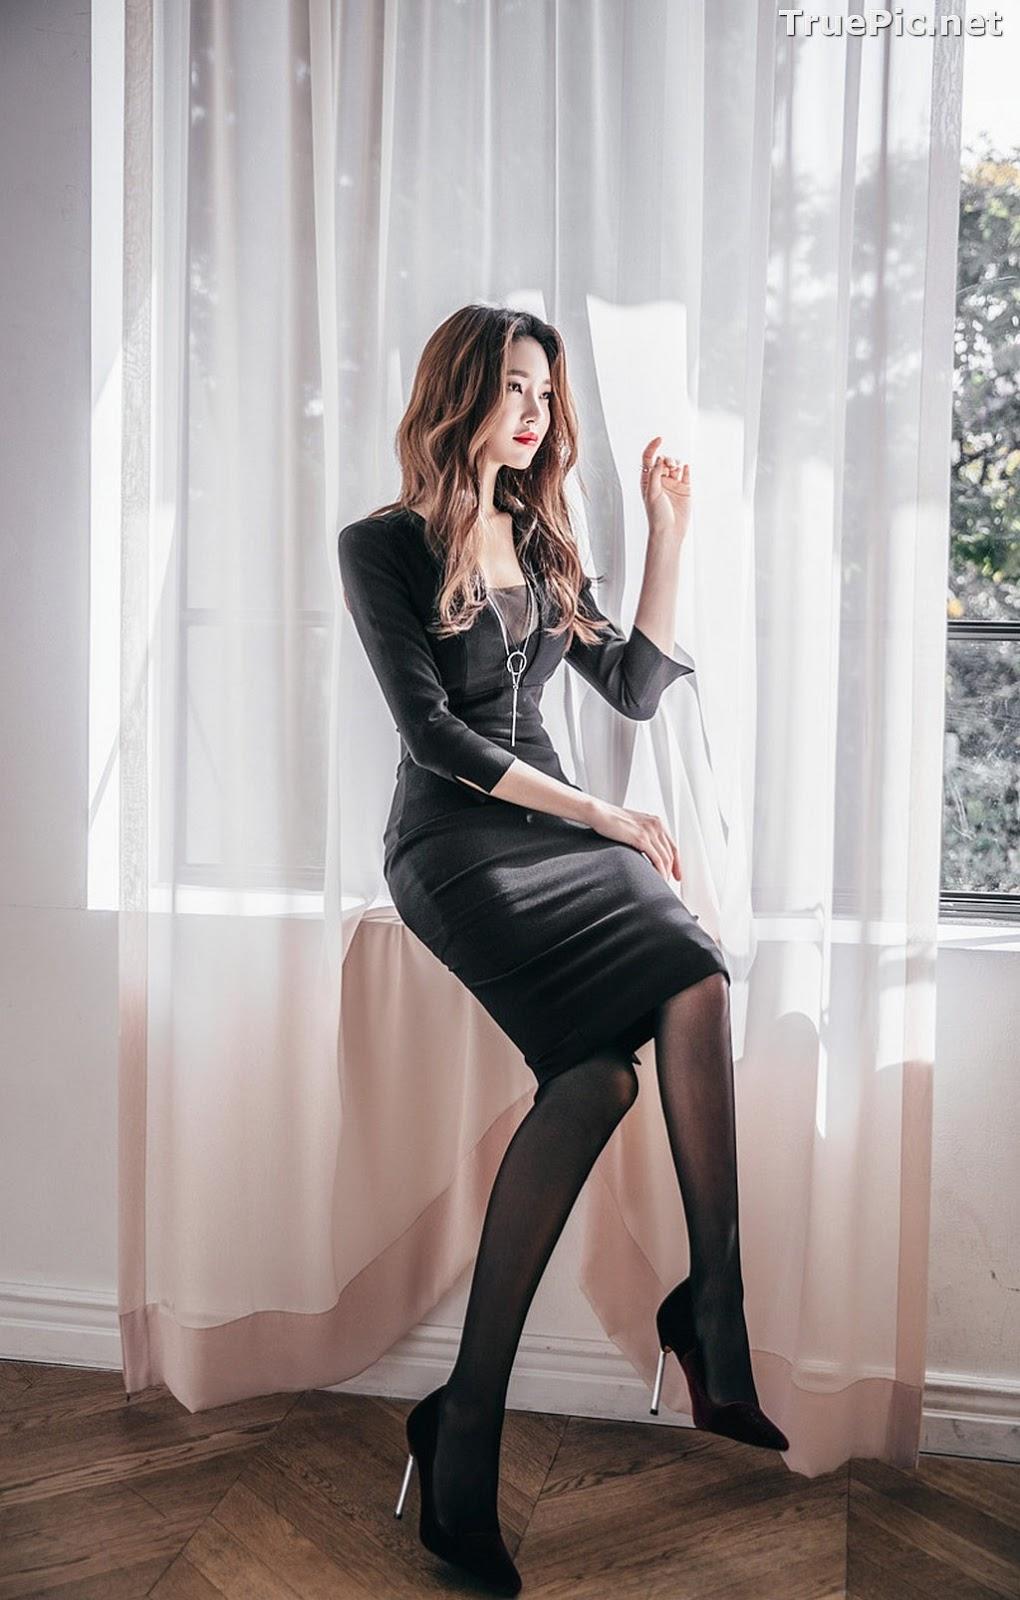 Image Korean Beautiful Model – Park Jung Yoon – Fashion Photography #4 - TruePic.net - Picture-6